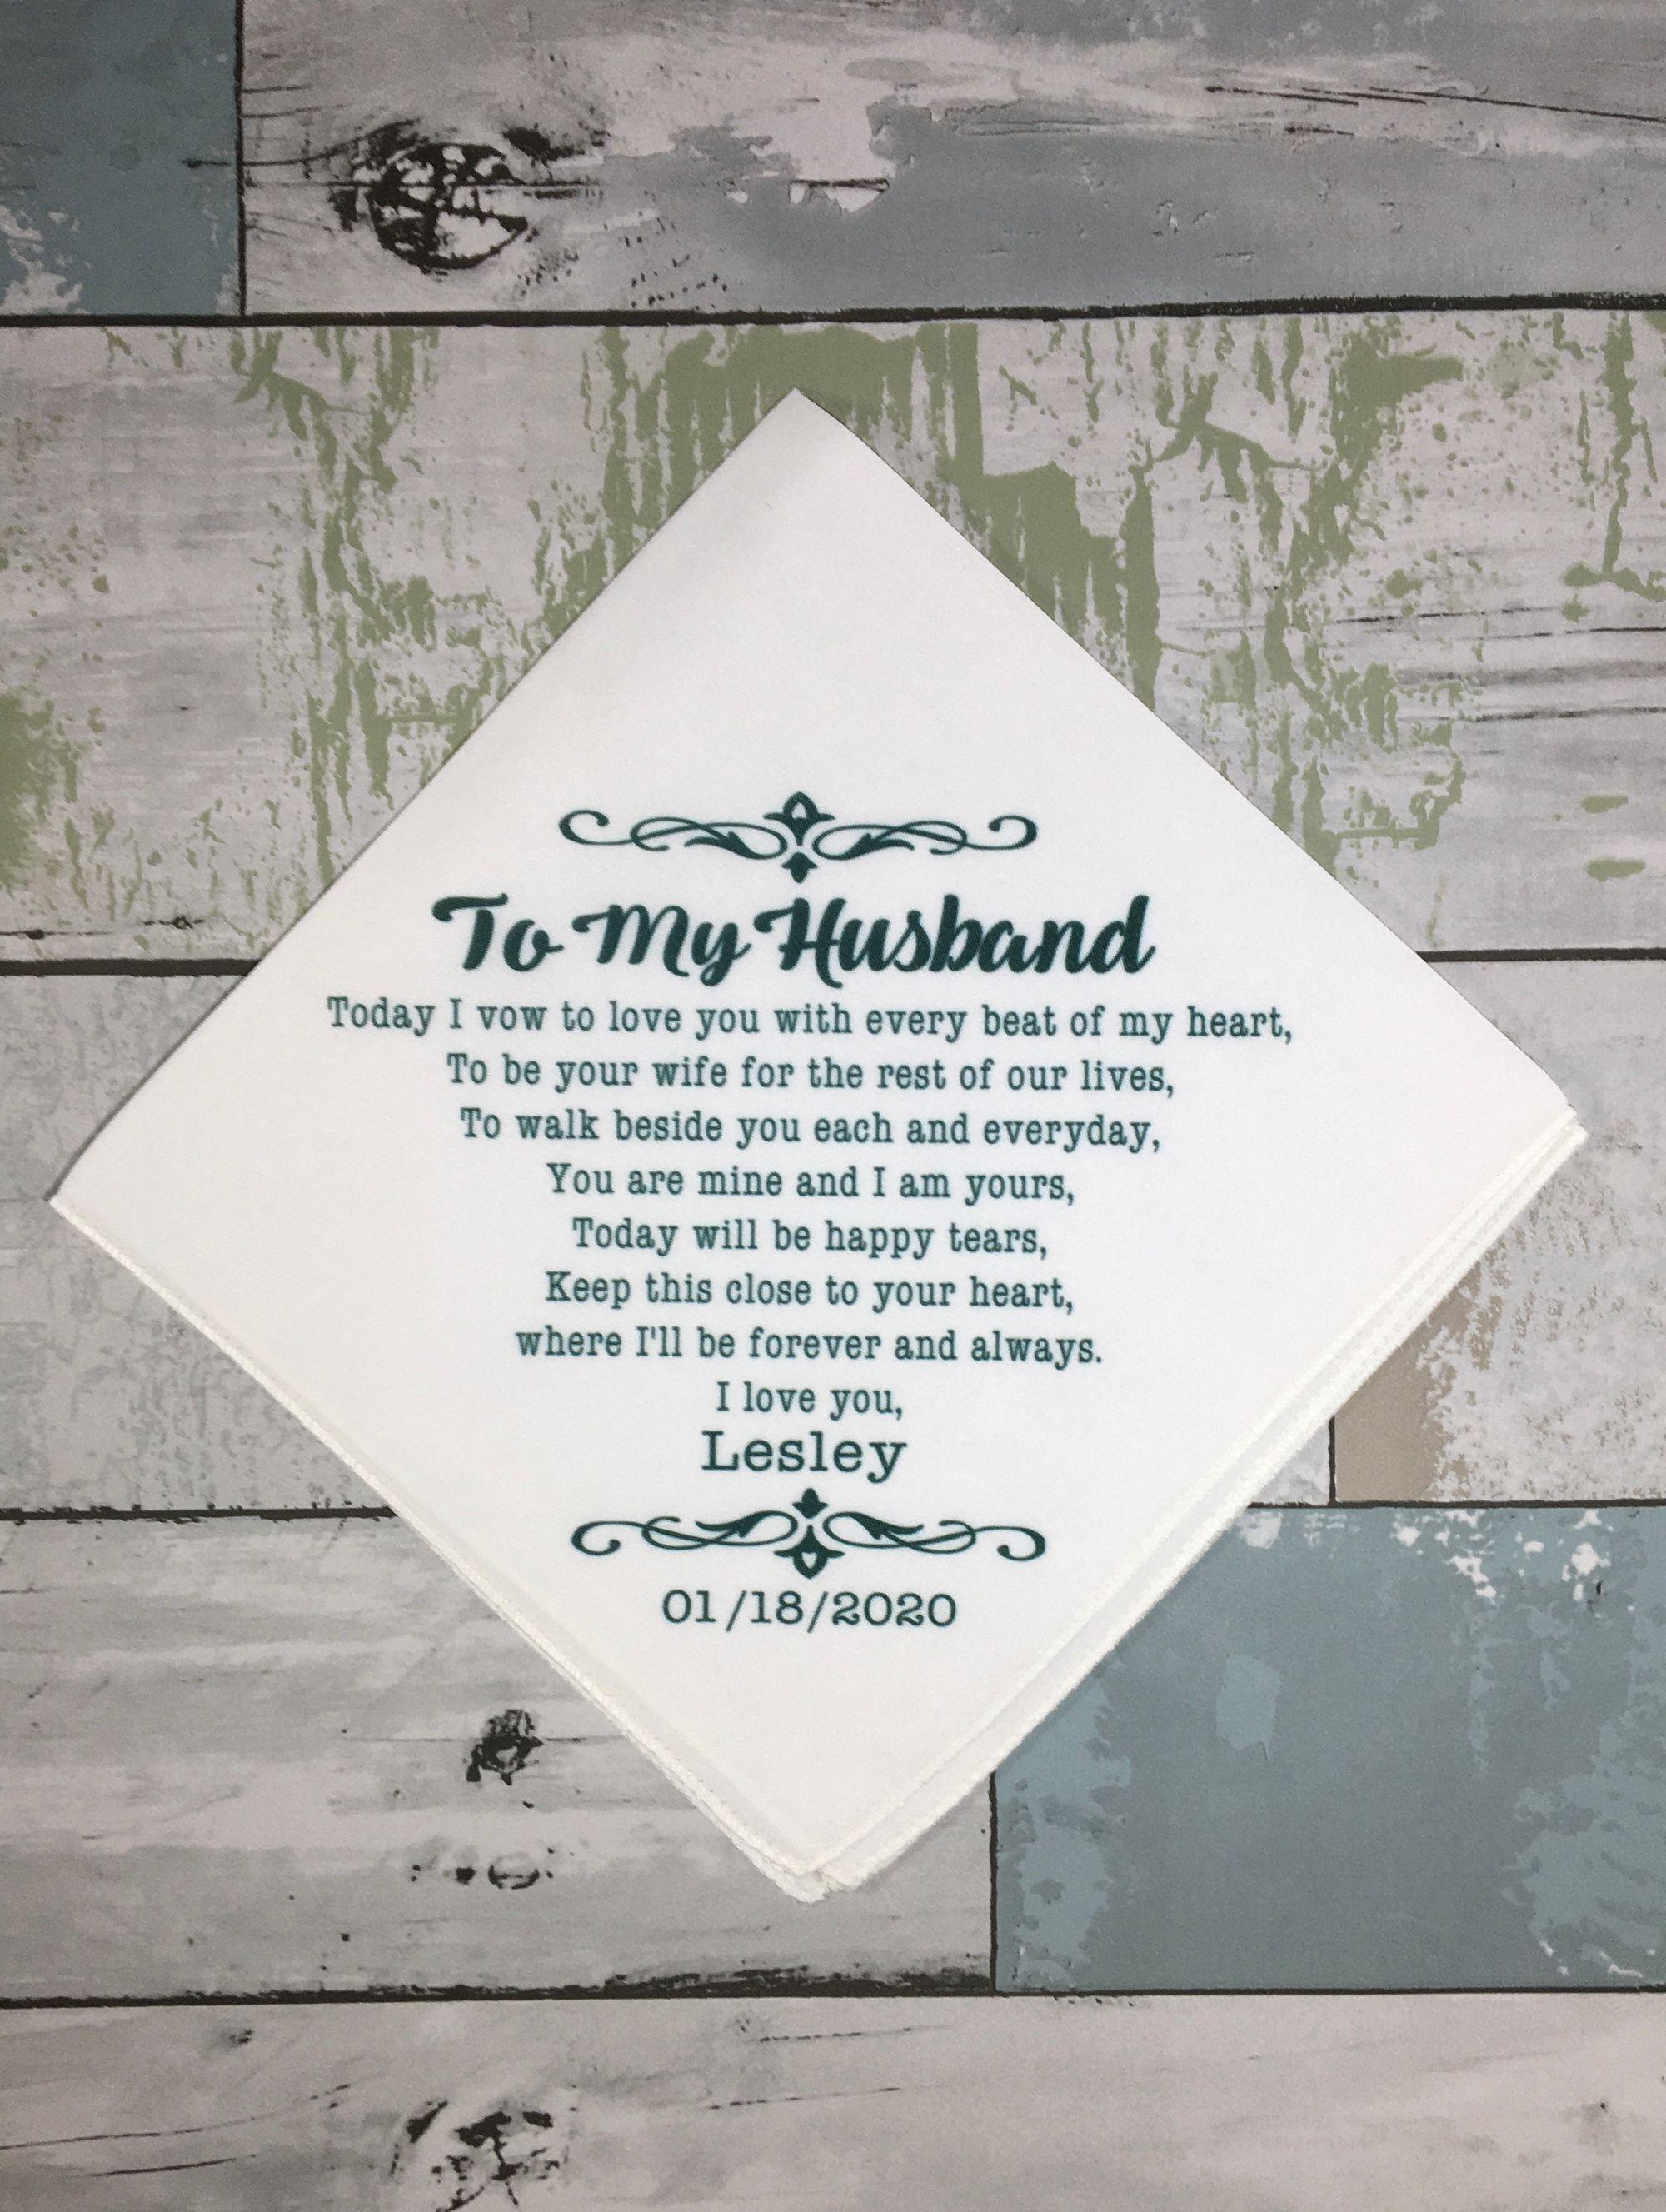 Custom Bride To Groom Wedding Gift Personalized Groom Gift Etsy In 2020 Wedding Handkerchief Personalized Handkerchief Wedding Wedding Day Gifts